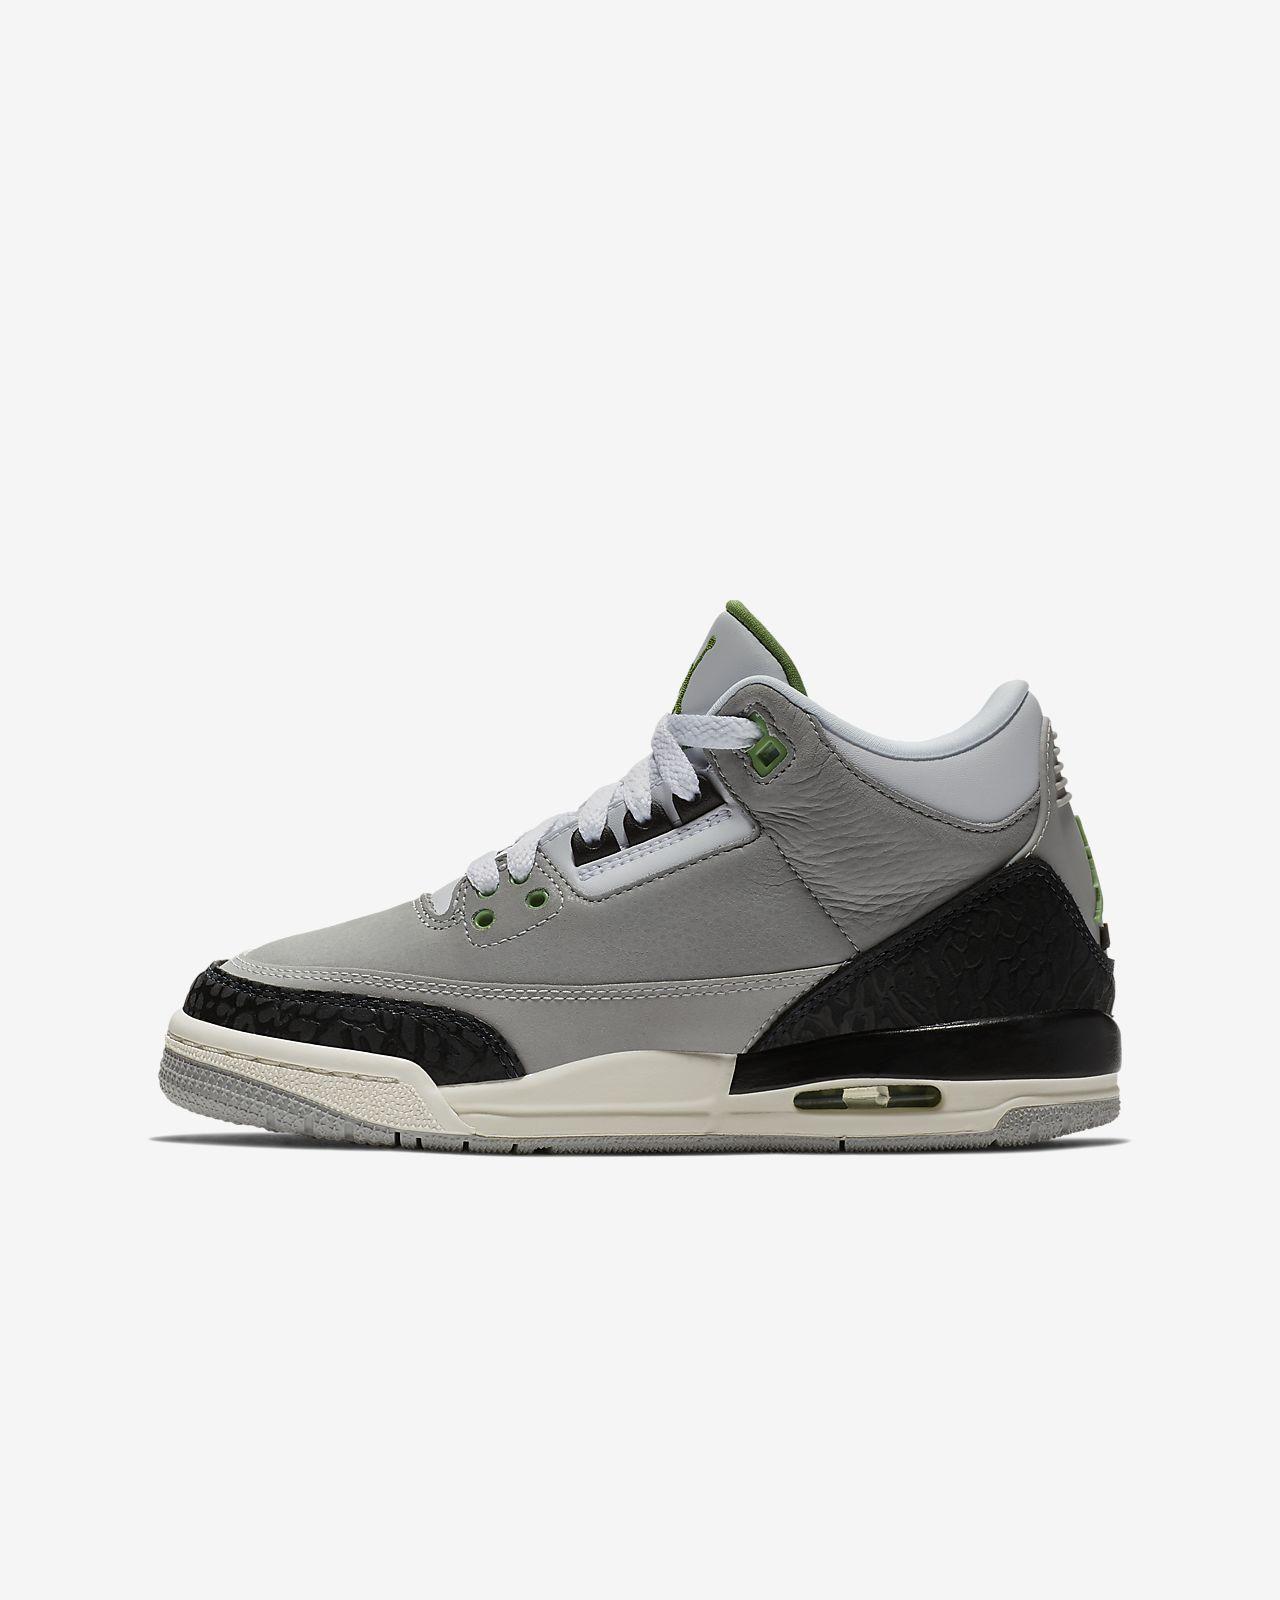 hot sale online 47a17 ef6f8 Air Jordan 3 Retro Kids' Shoe. Nike.com CZ